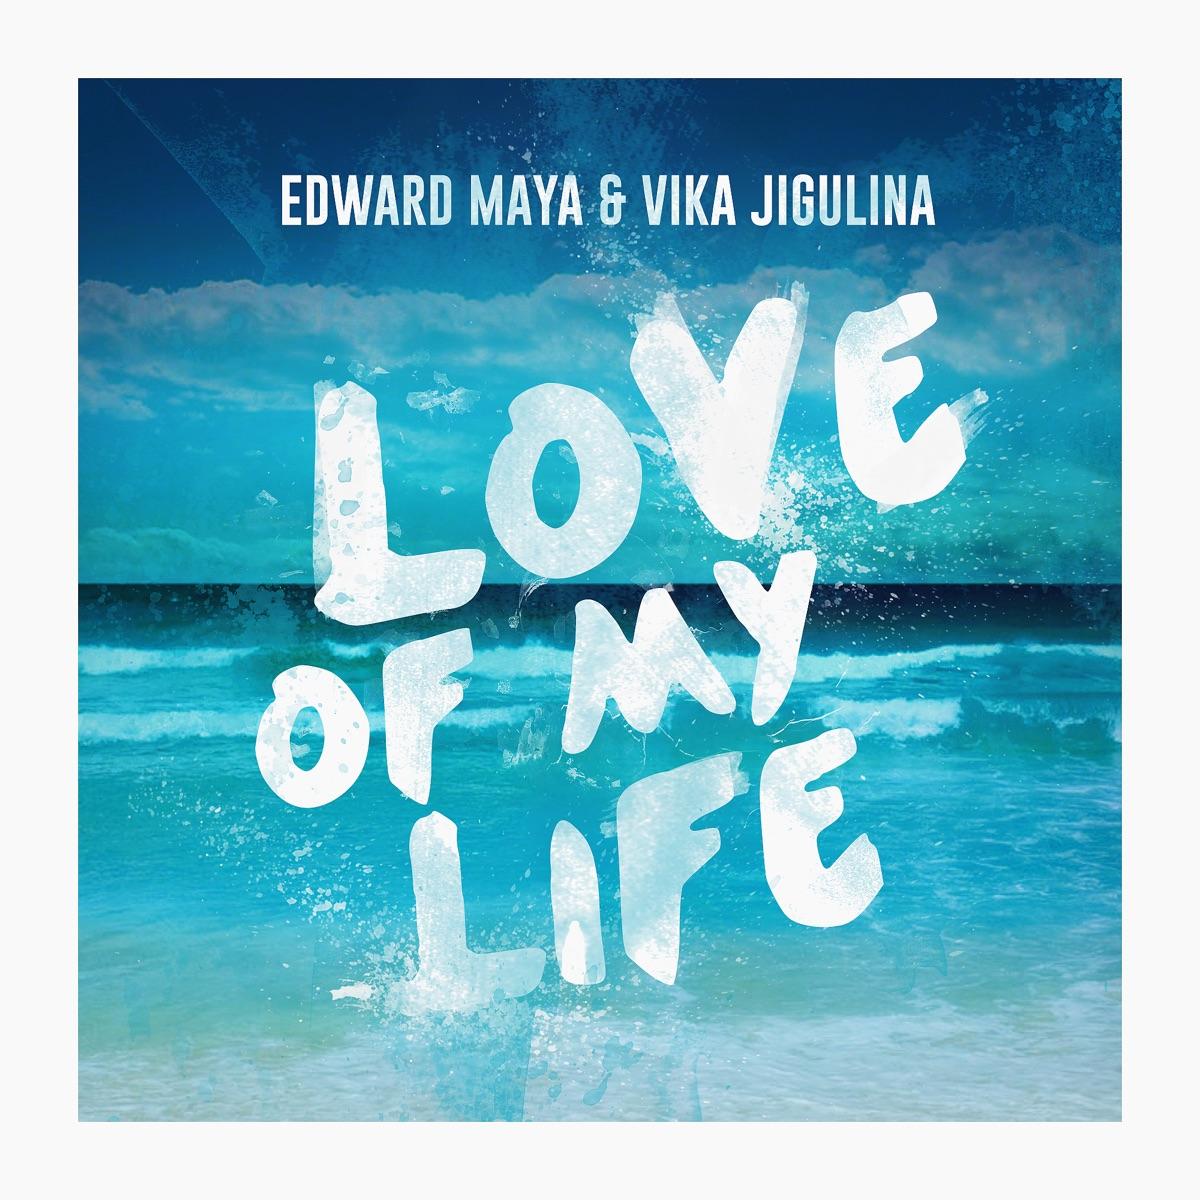 Love of My Life - EP Album Cover by Edward Maya & Vika Jigulina